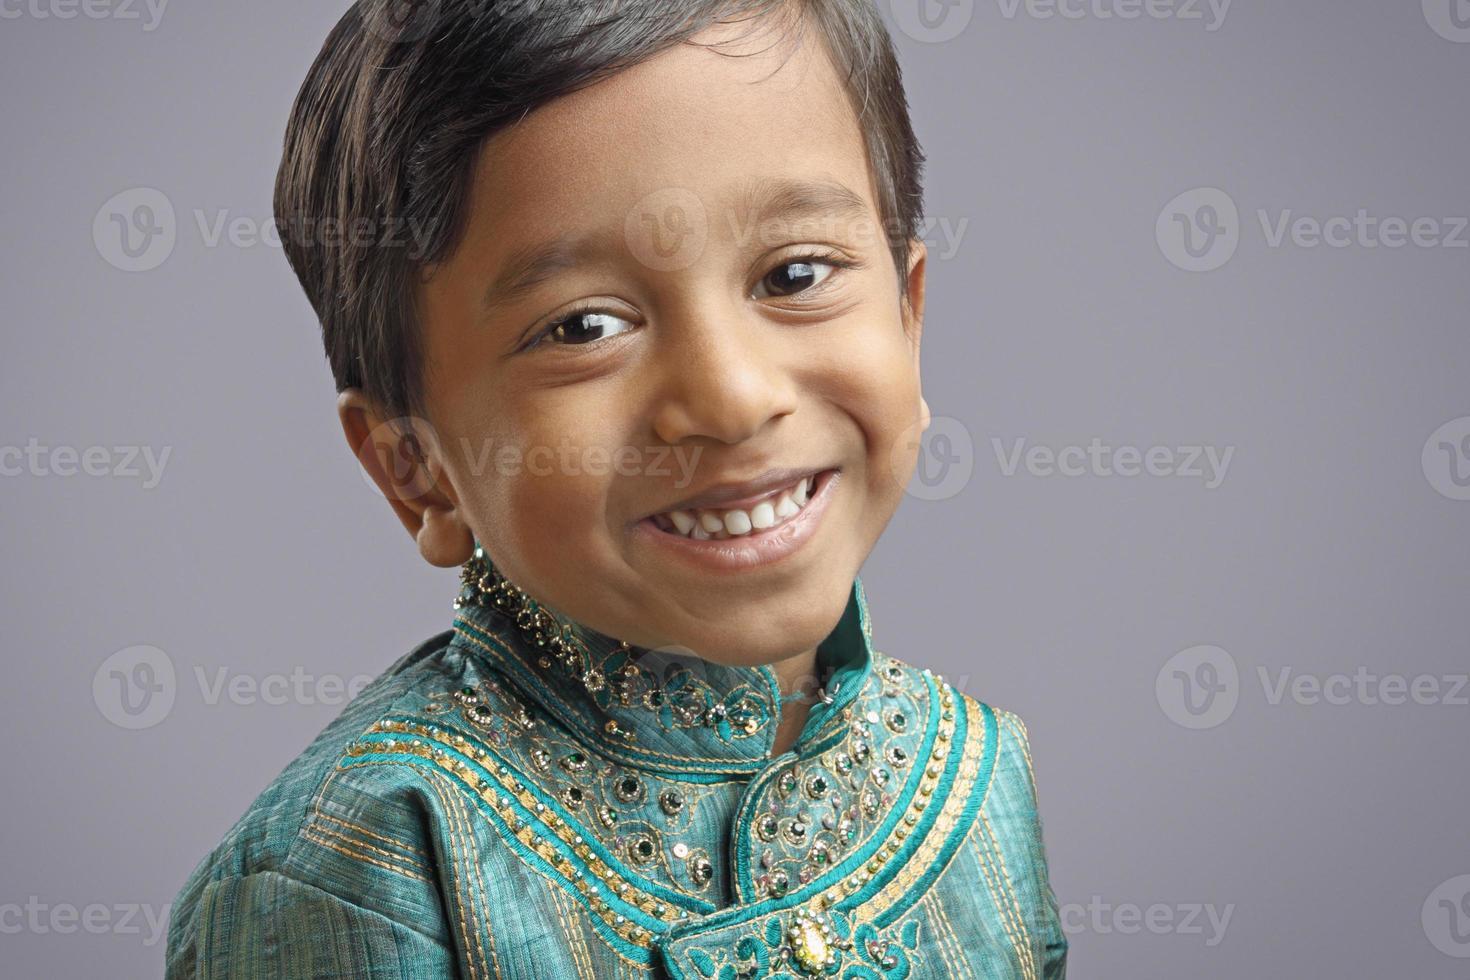 Indiase jongetje met traditionele kleding foto